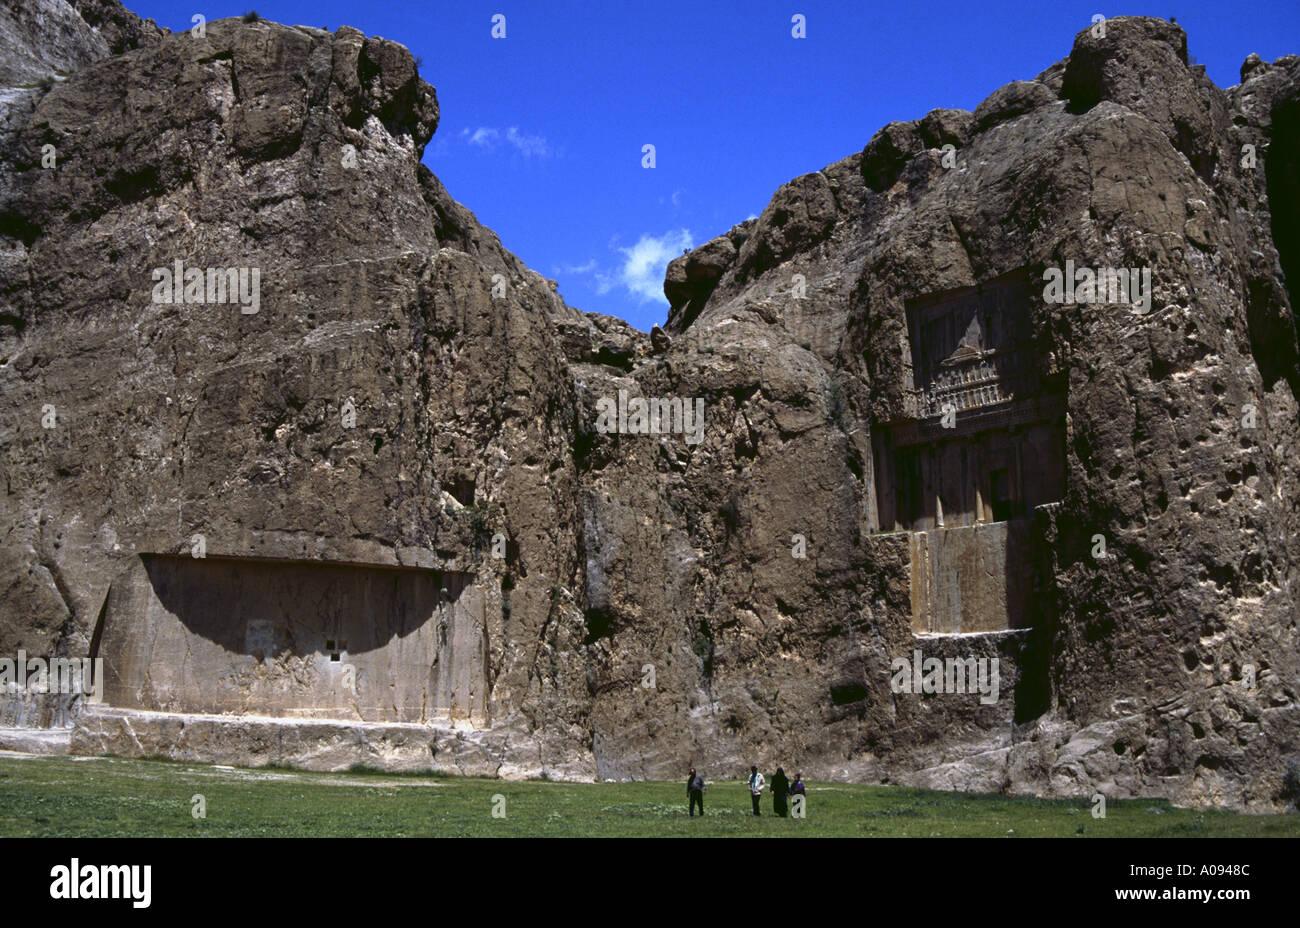 Iran Naqsh e Rostam tomb reliefs of the archaemenian king Xerxes I - Stock Image